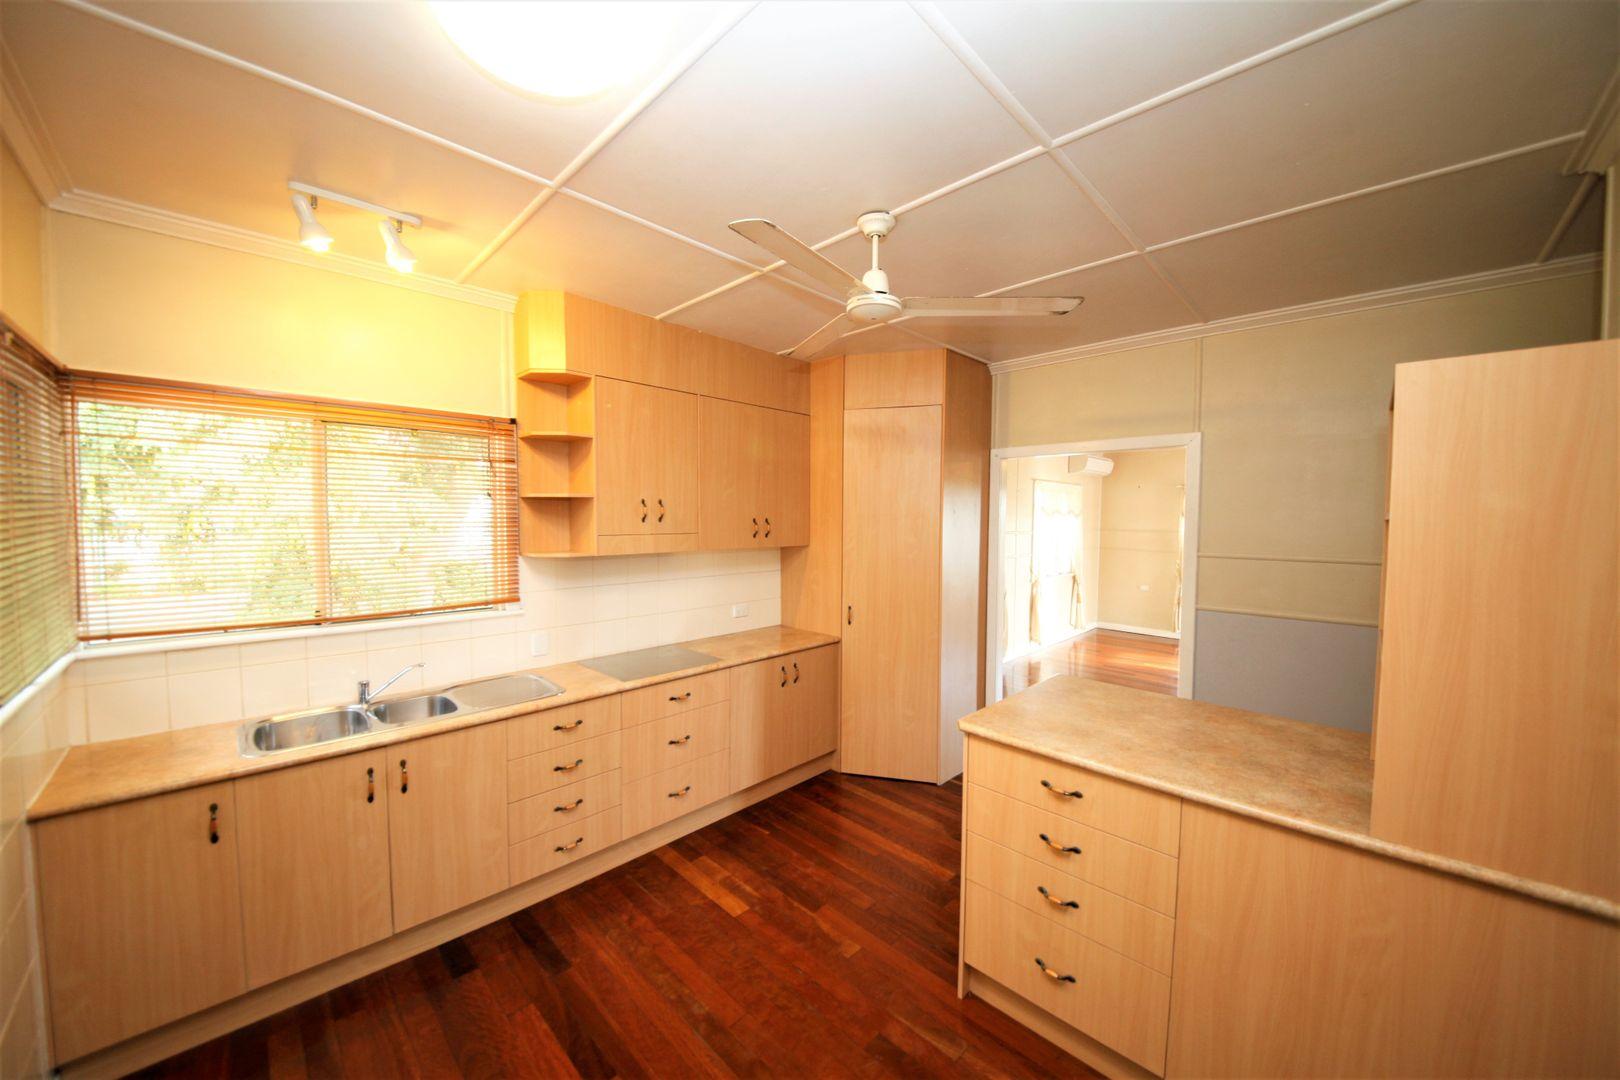 29 Gympie Rd, Tinana QLD 4650, Image 1